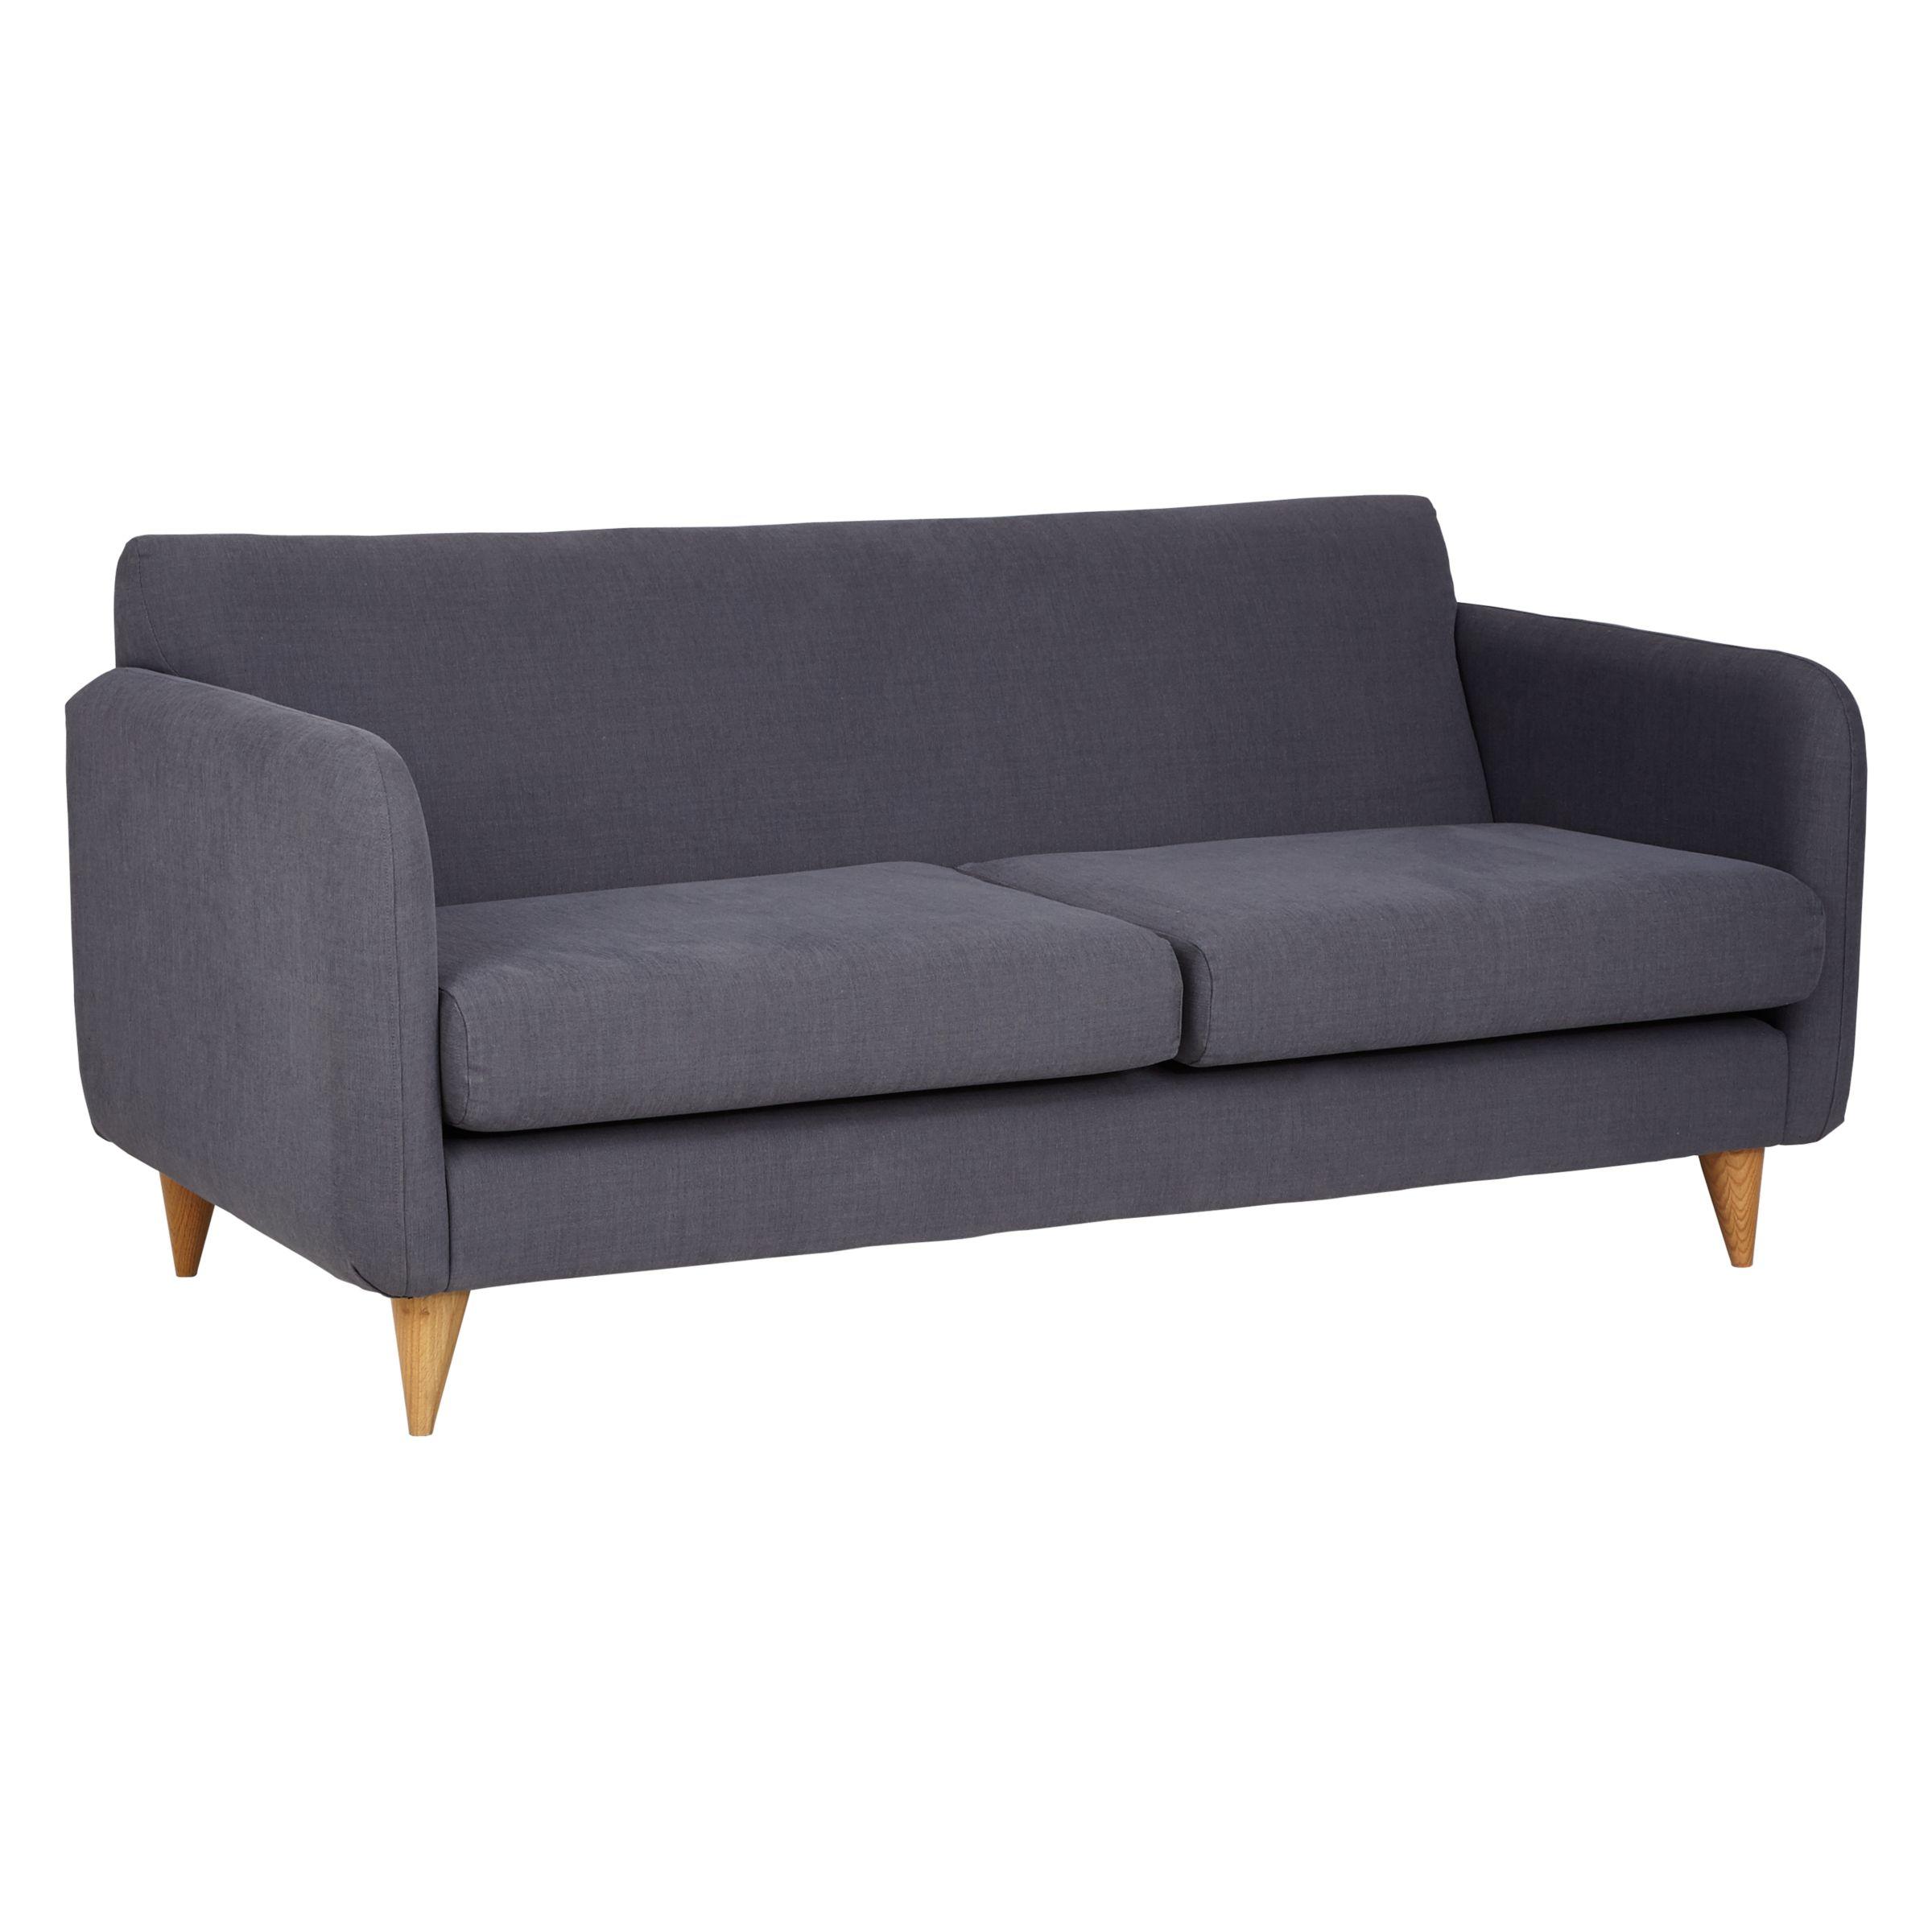 Petite Sofas Light Fabric Snuggler Small 2 Seater Settees